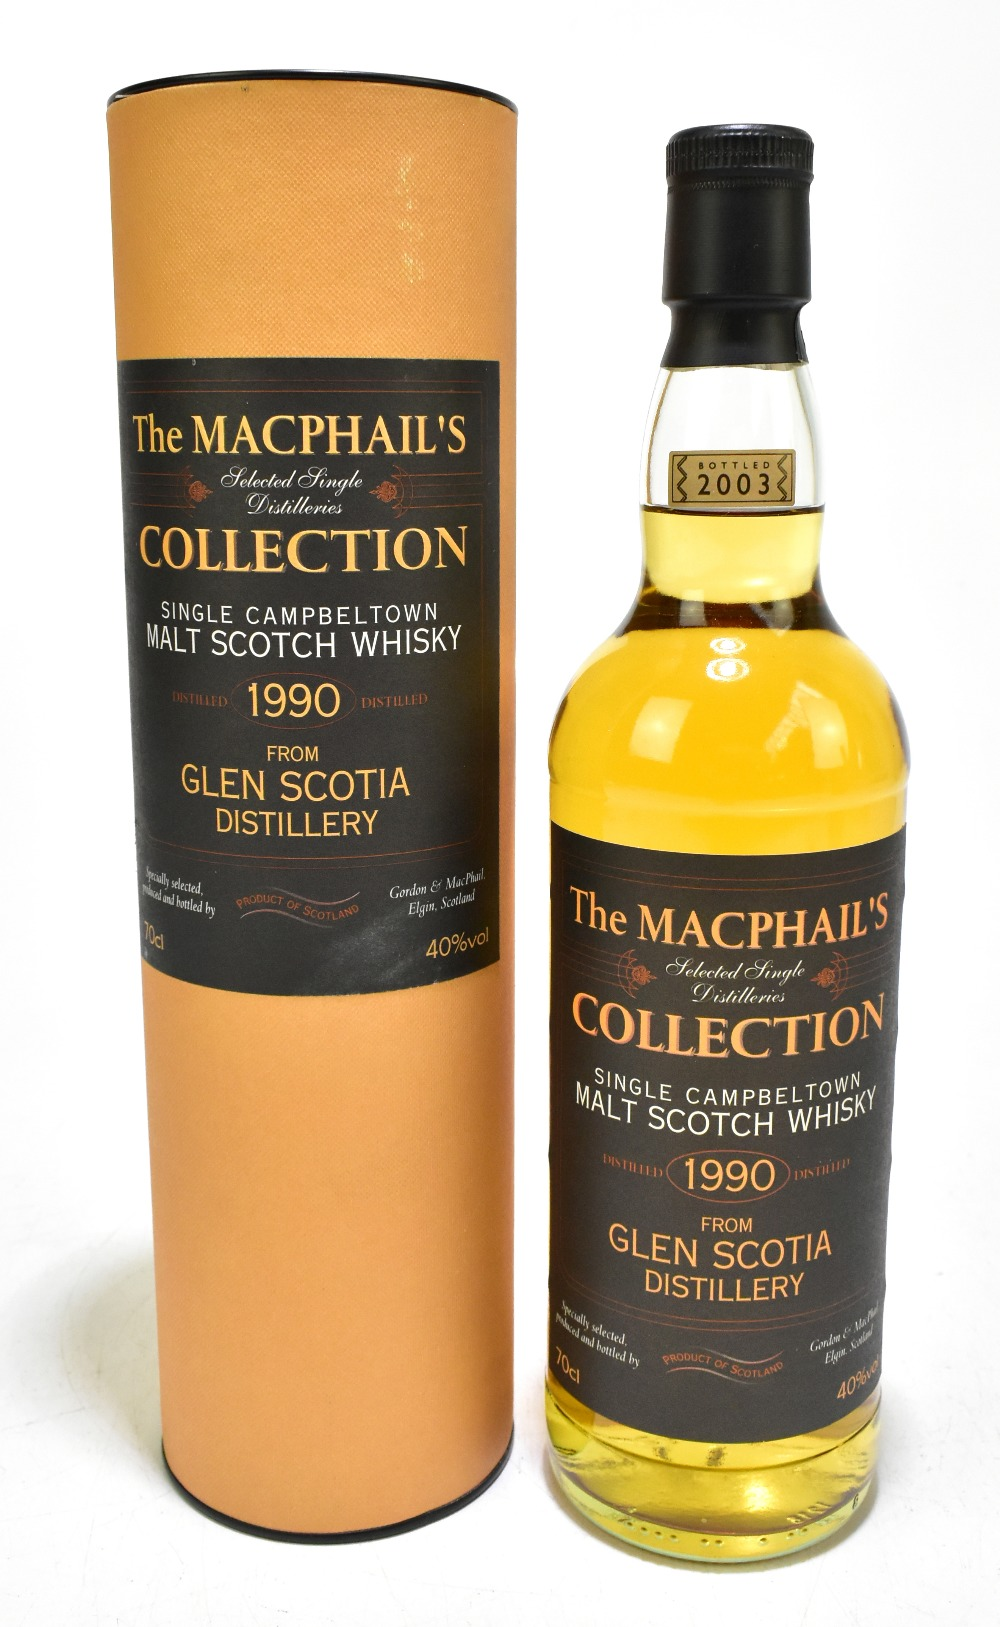 WHISKY; a single bottle of Glen Scotia aged 13 years single Campbeltown malt Scotch whisky,